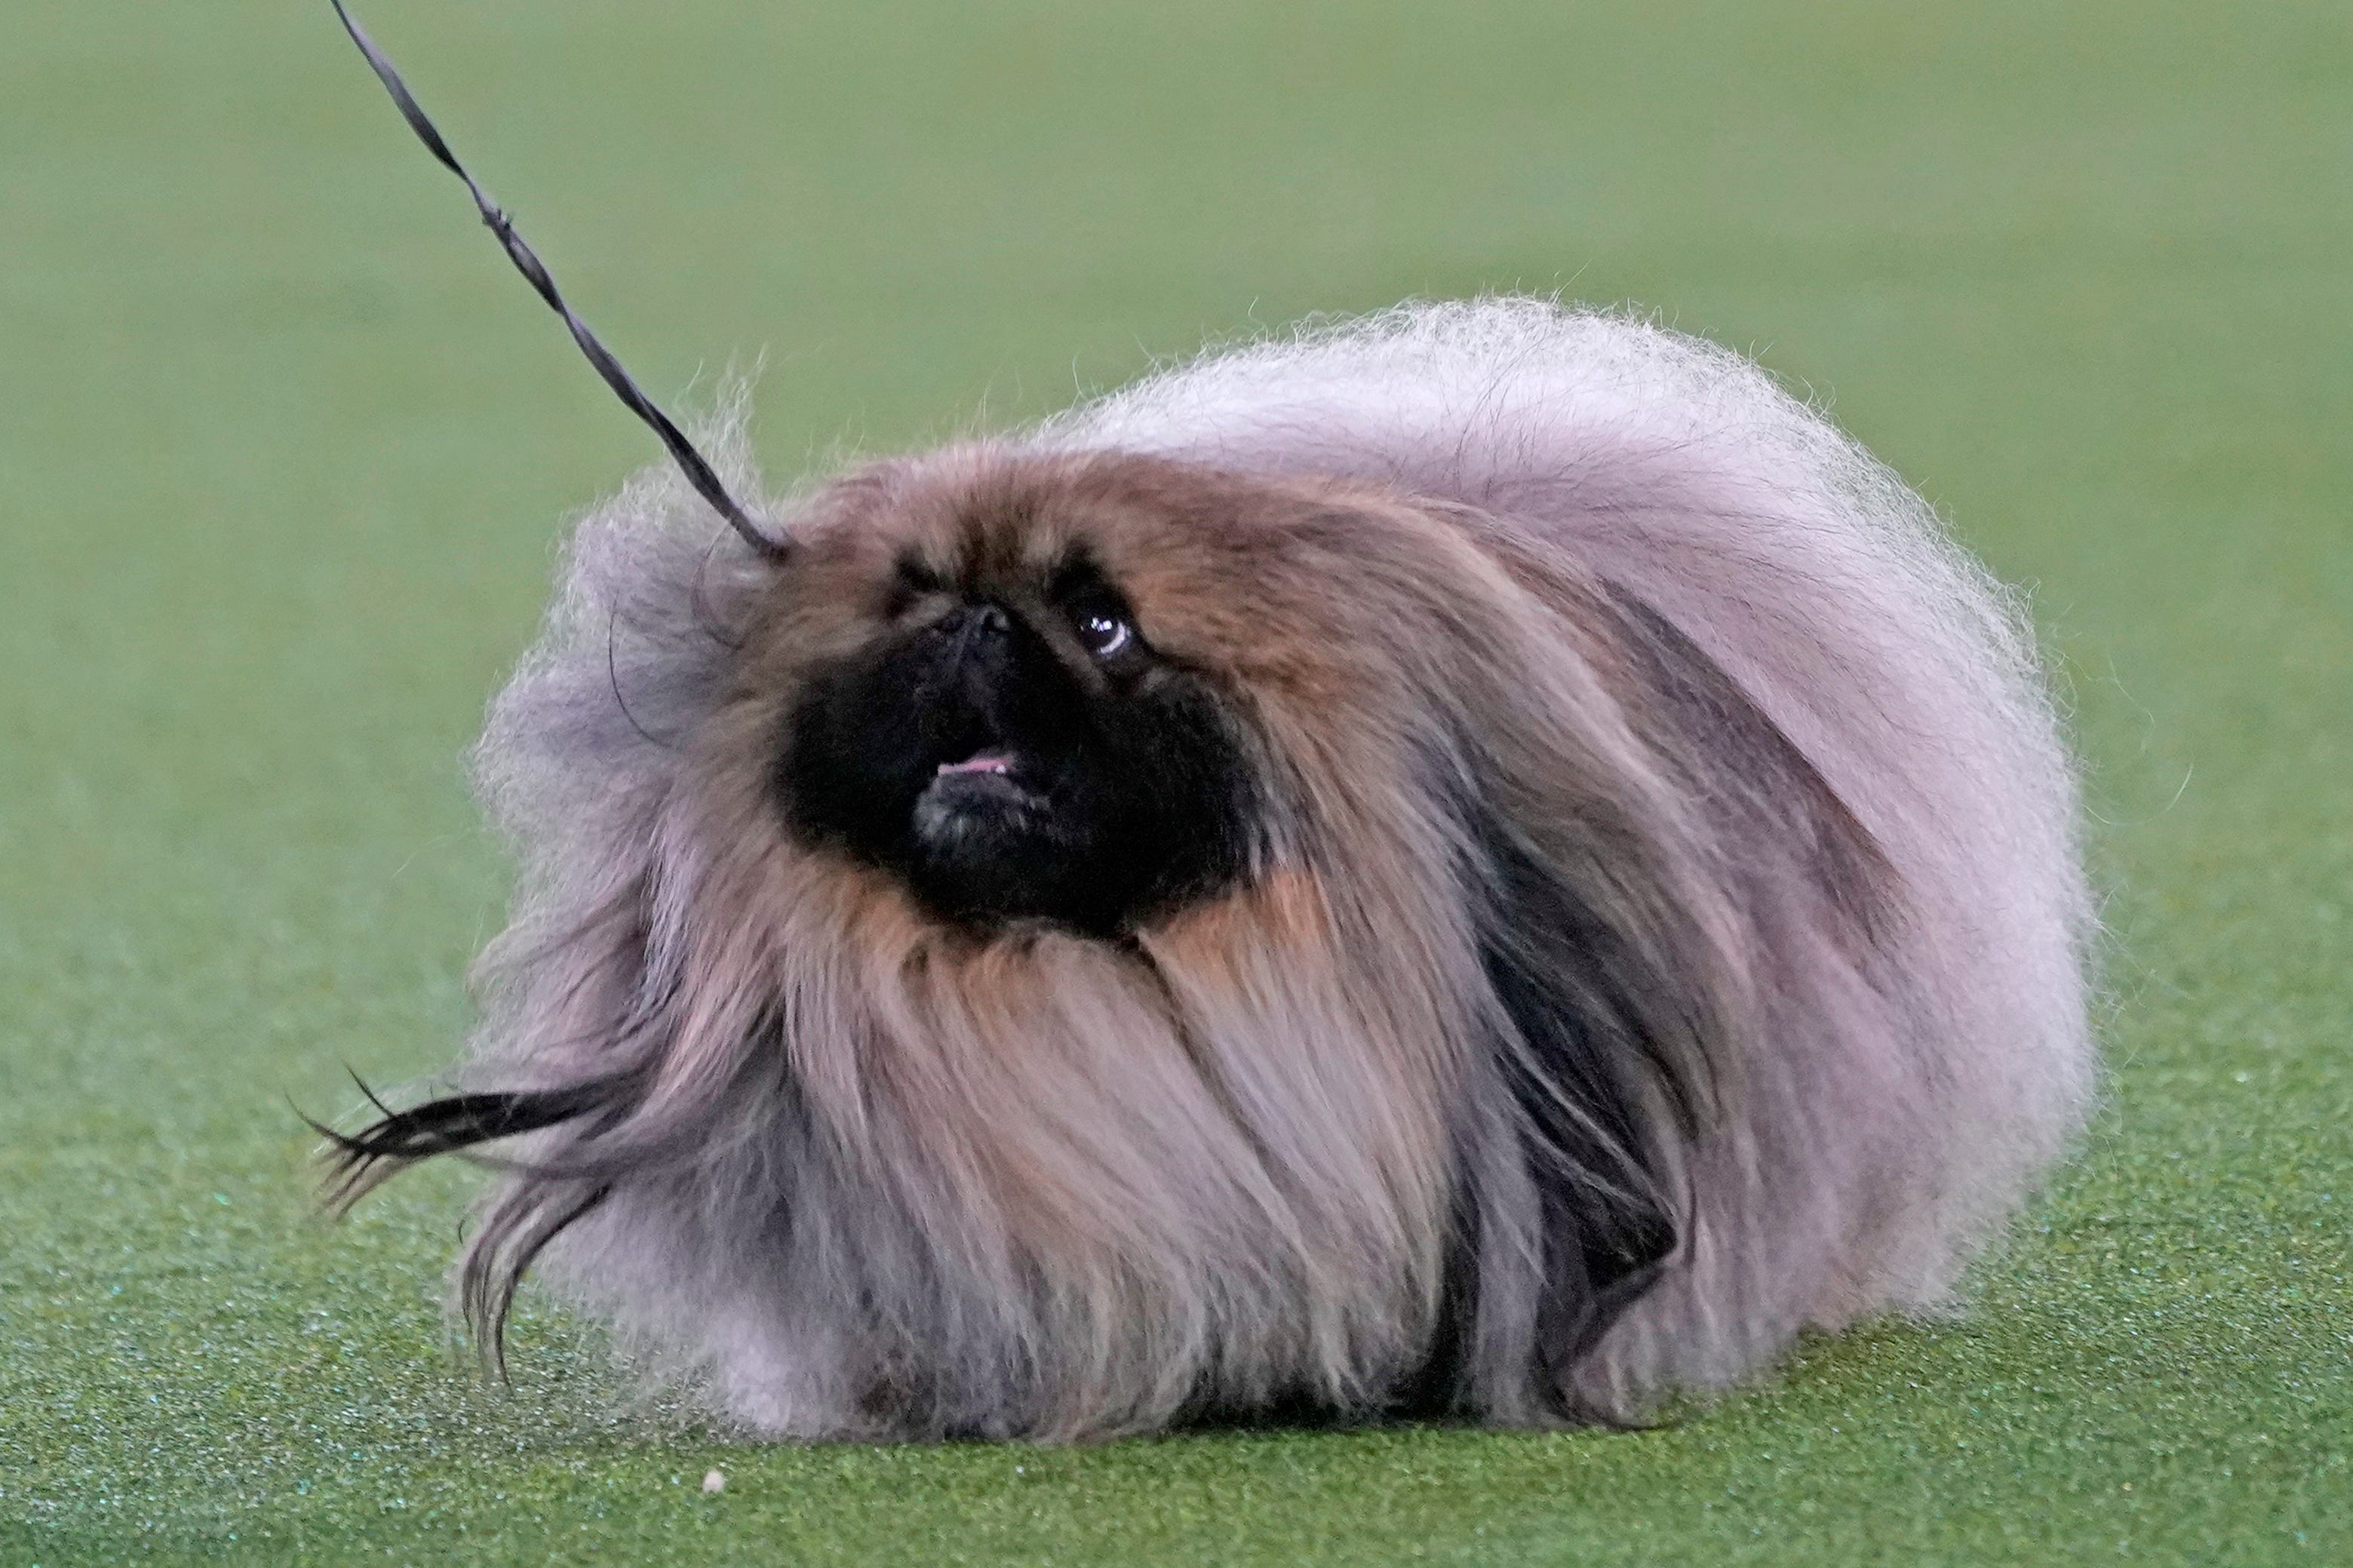 Top dog! Pekingese named Wasabi wins Westminster dog show 2